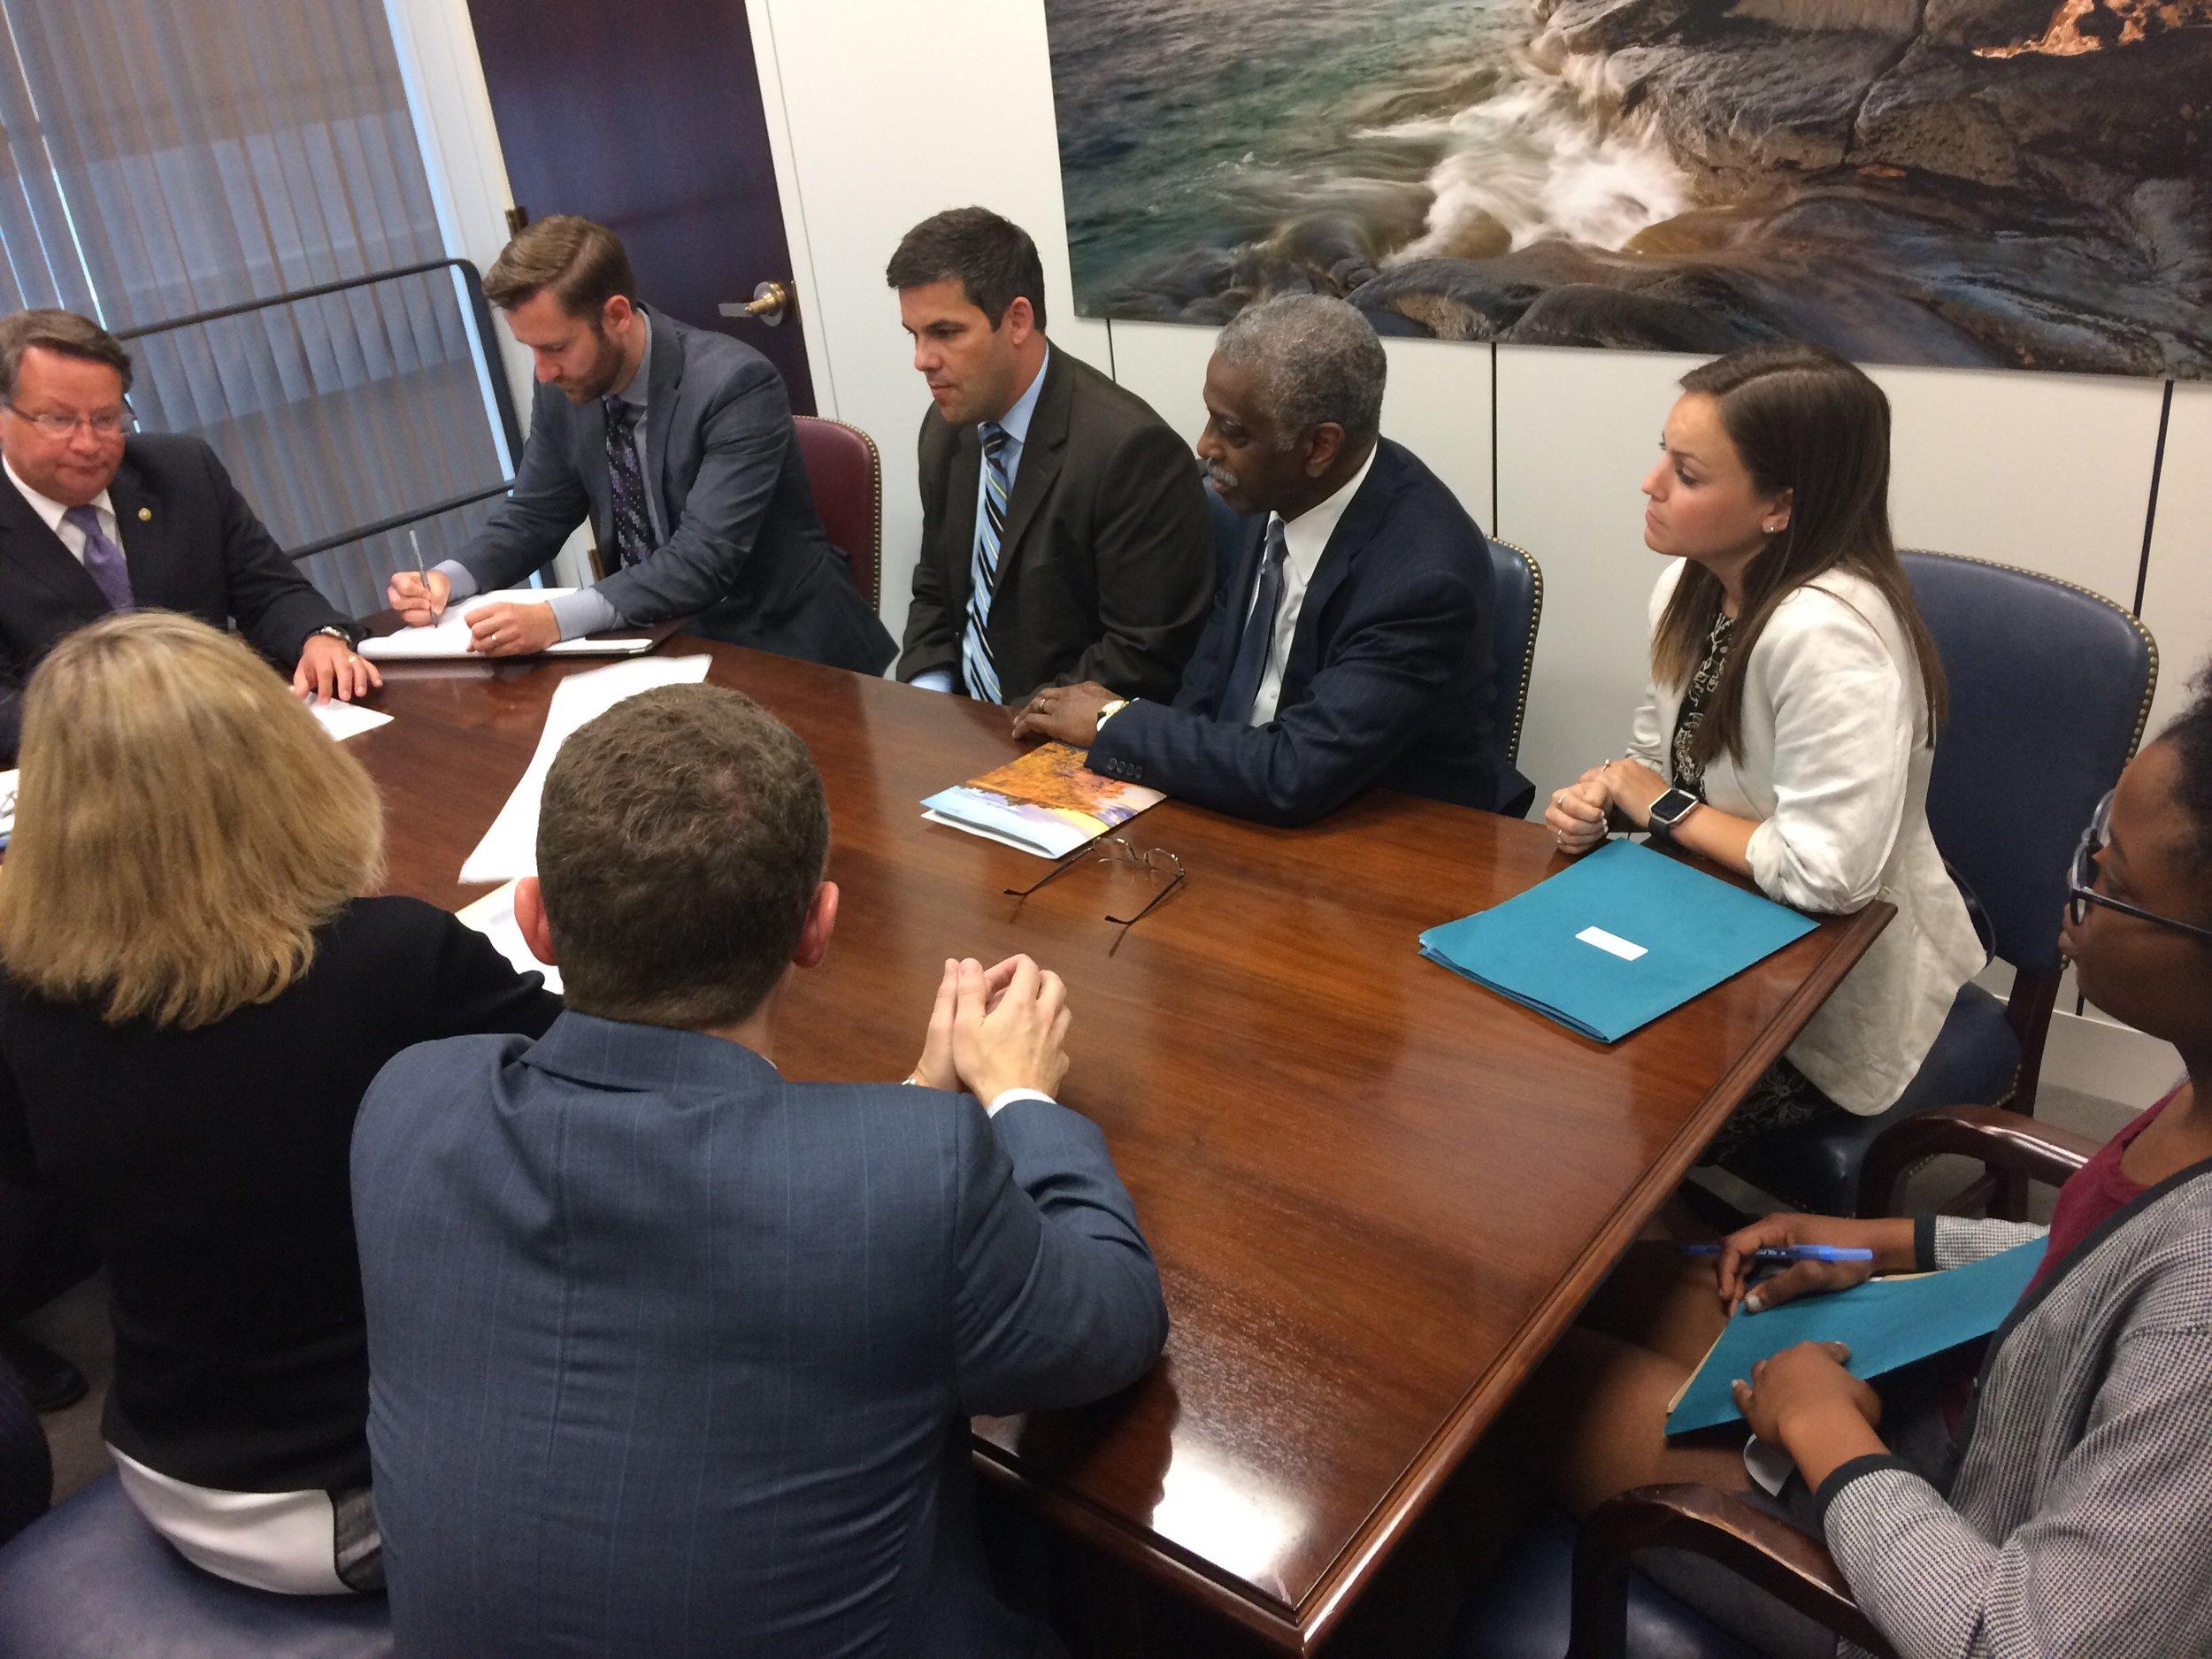 Me (far right) at a lobbying meeting with U.S. Senator Gary Peters.